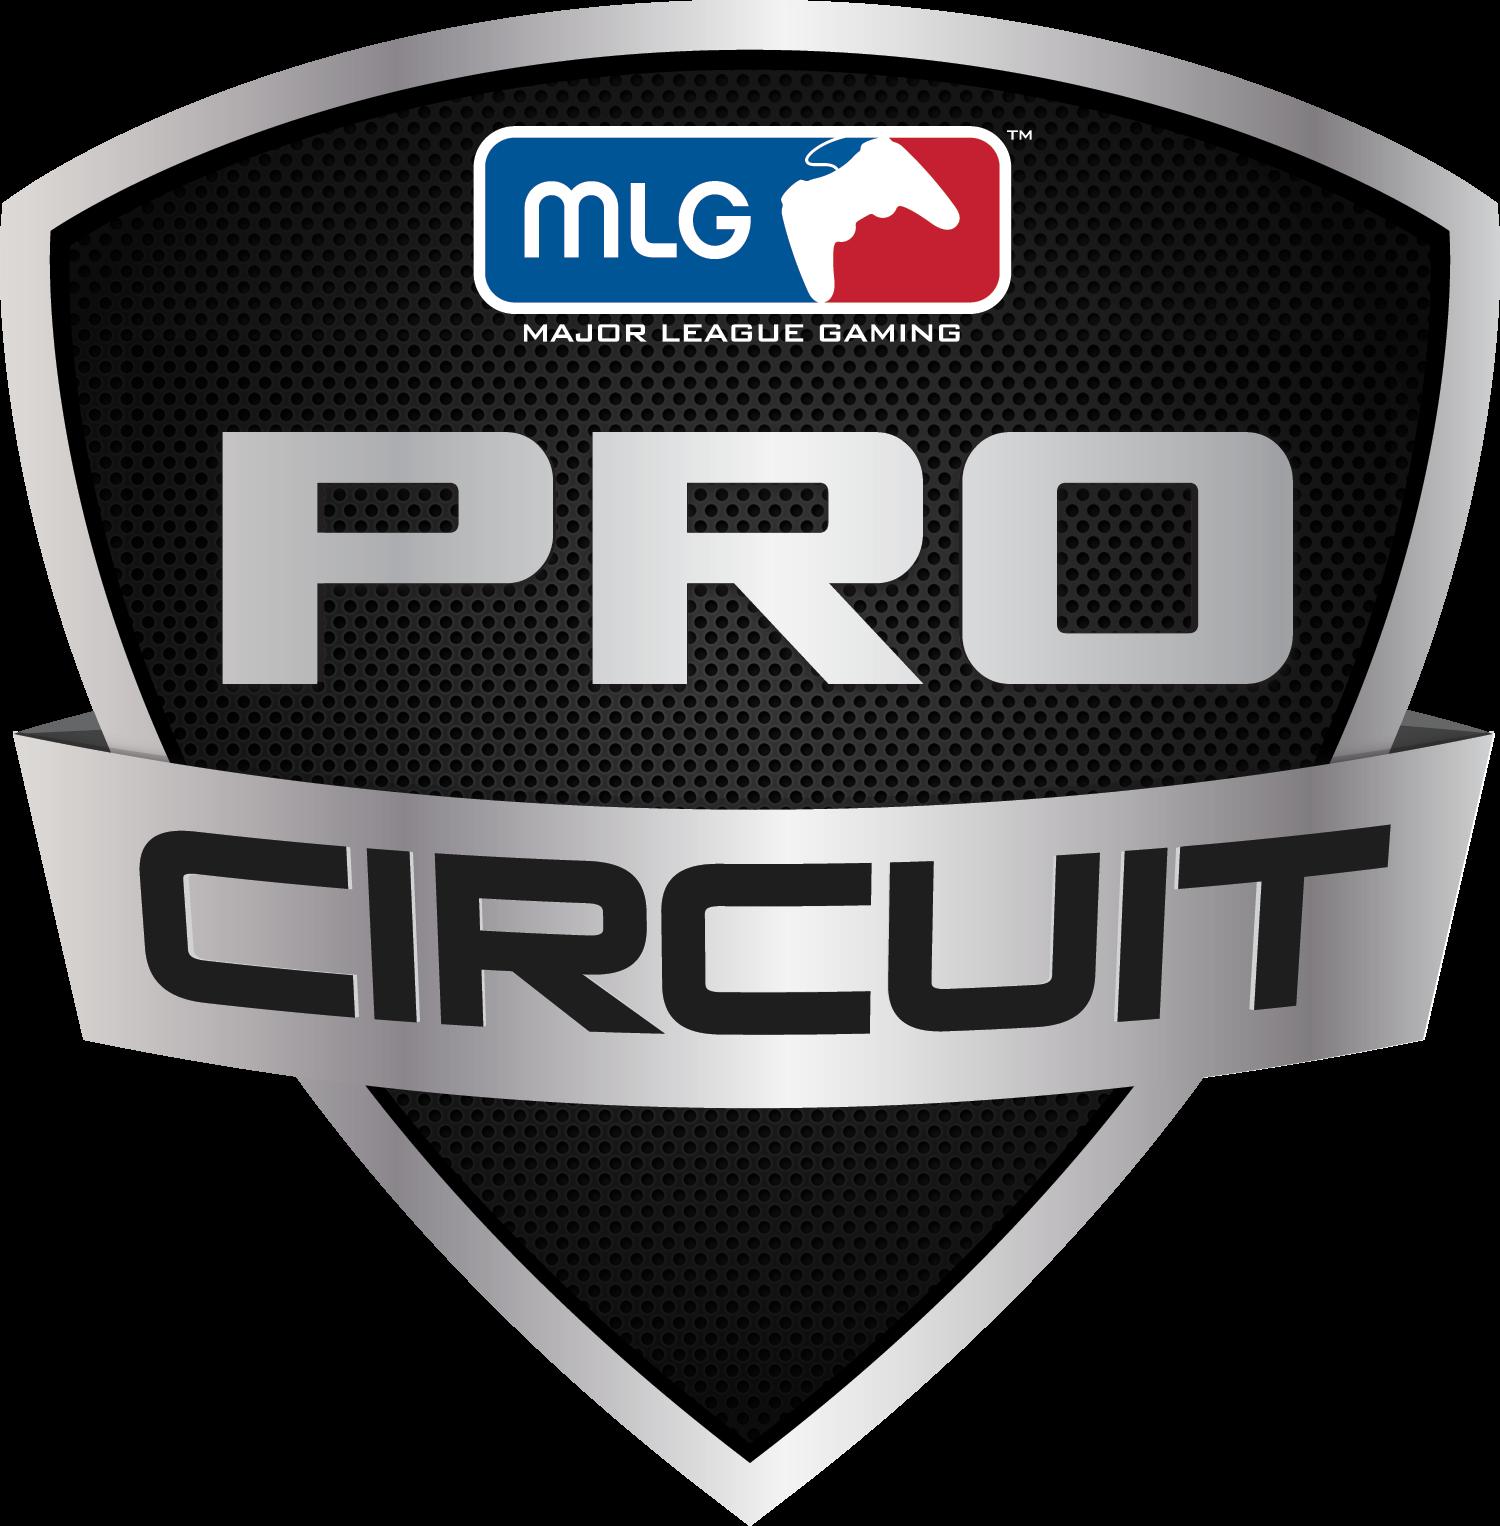 Mlg Pro Circuit Logo Mlg Pro Circuit Logo